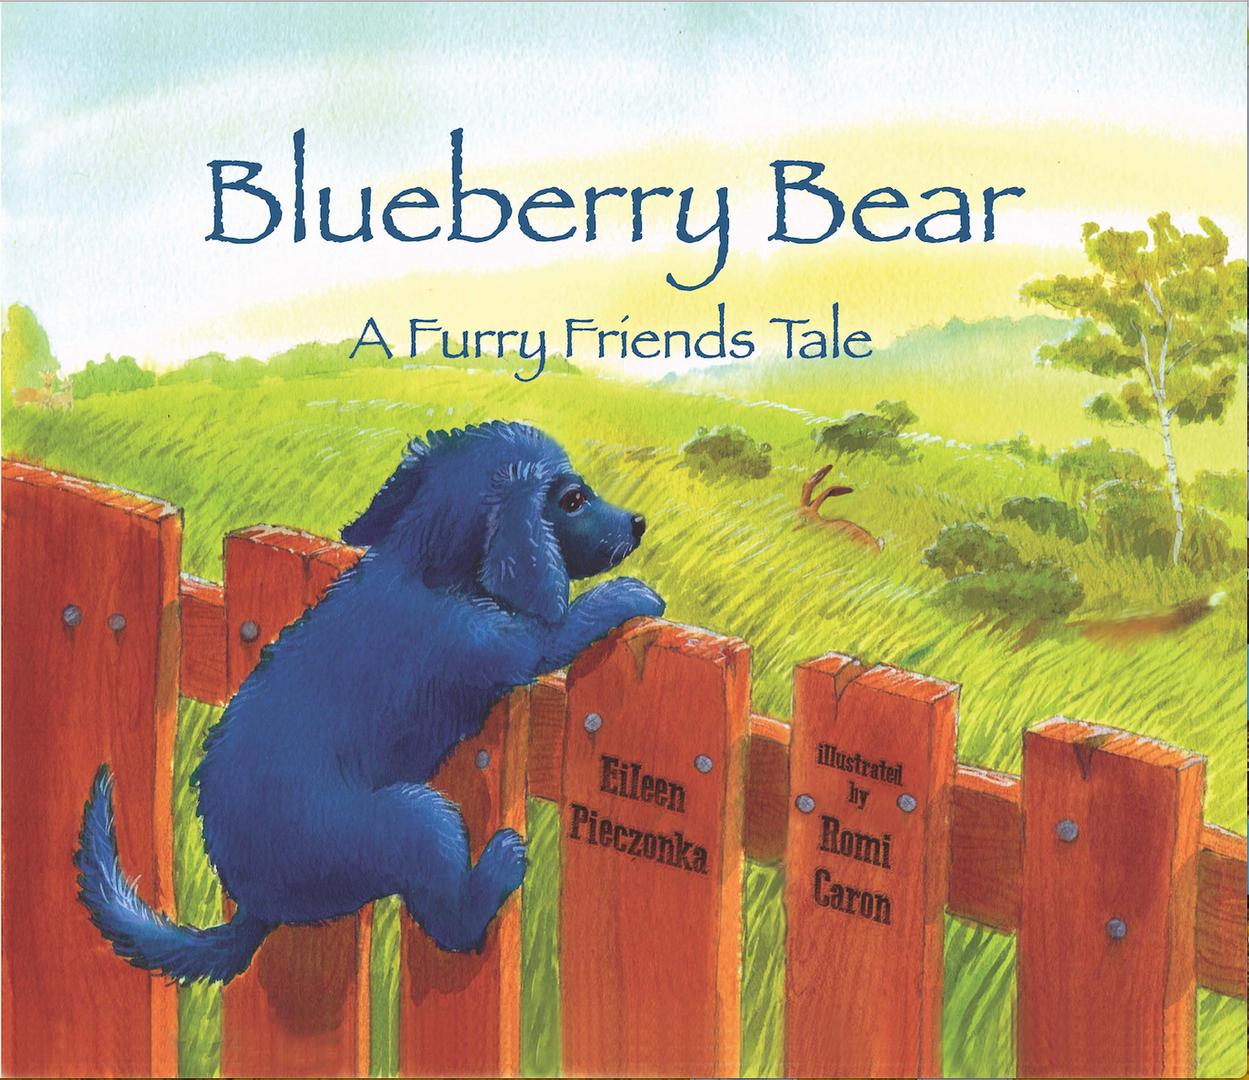 Blueberry Bear A Furry Friends Tale Book